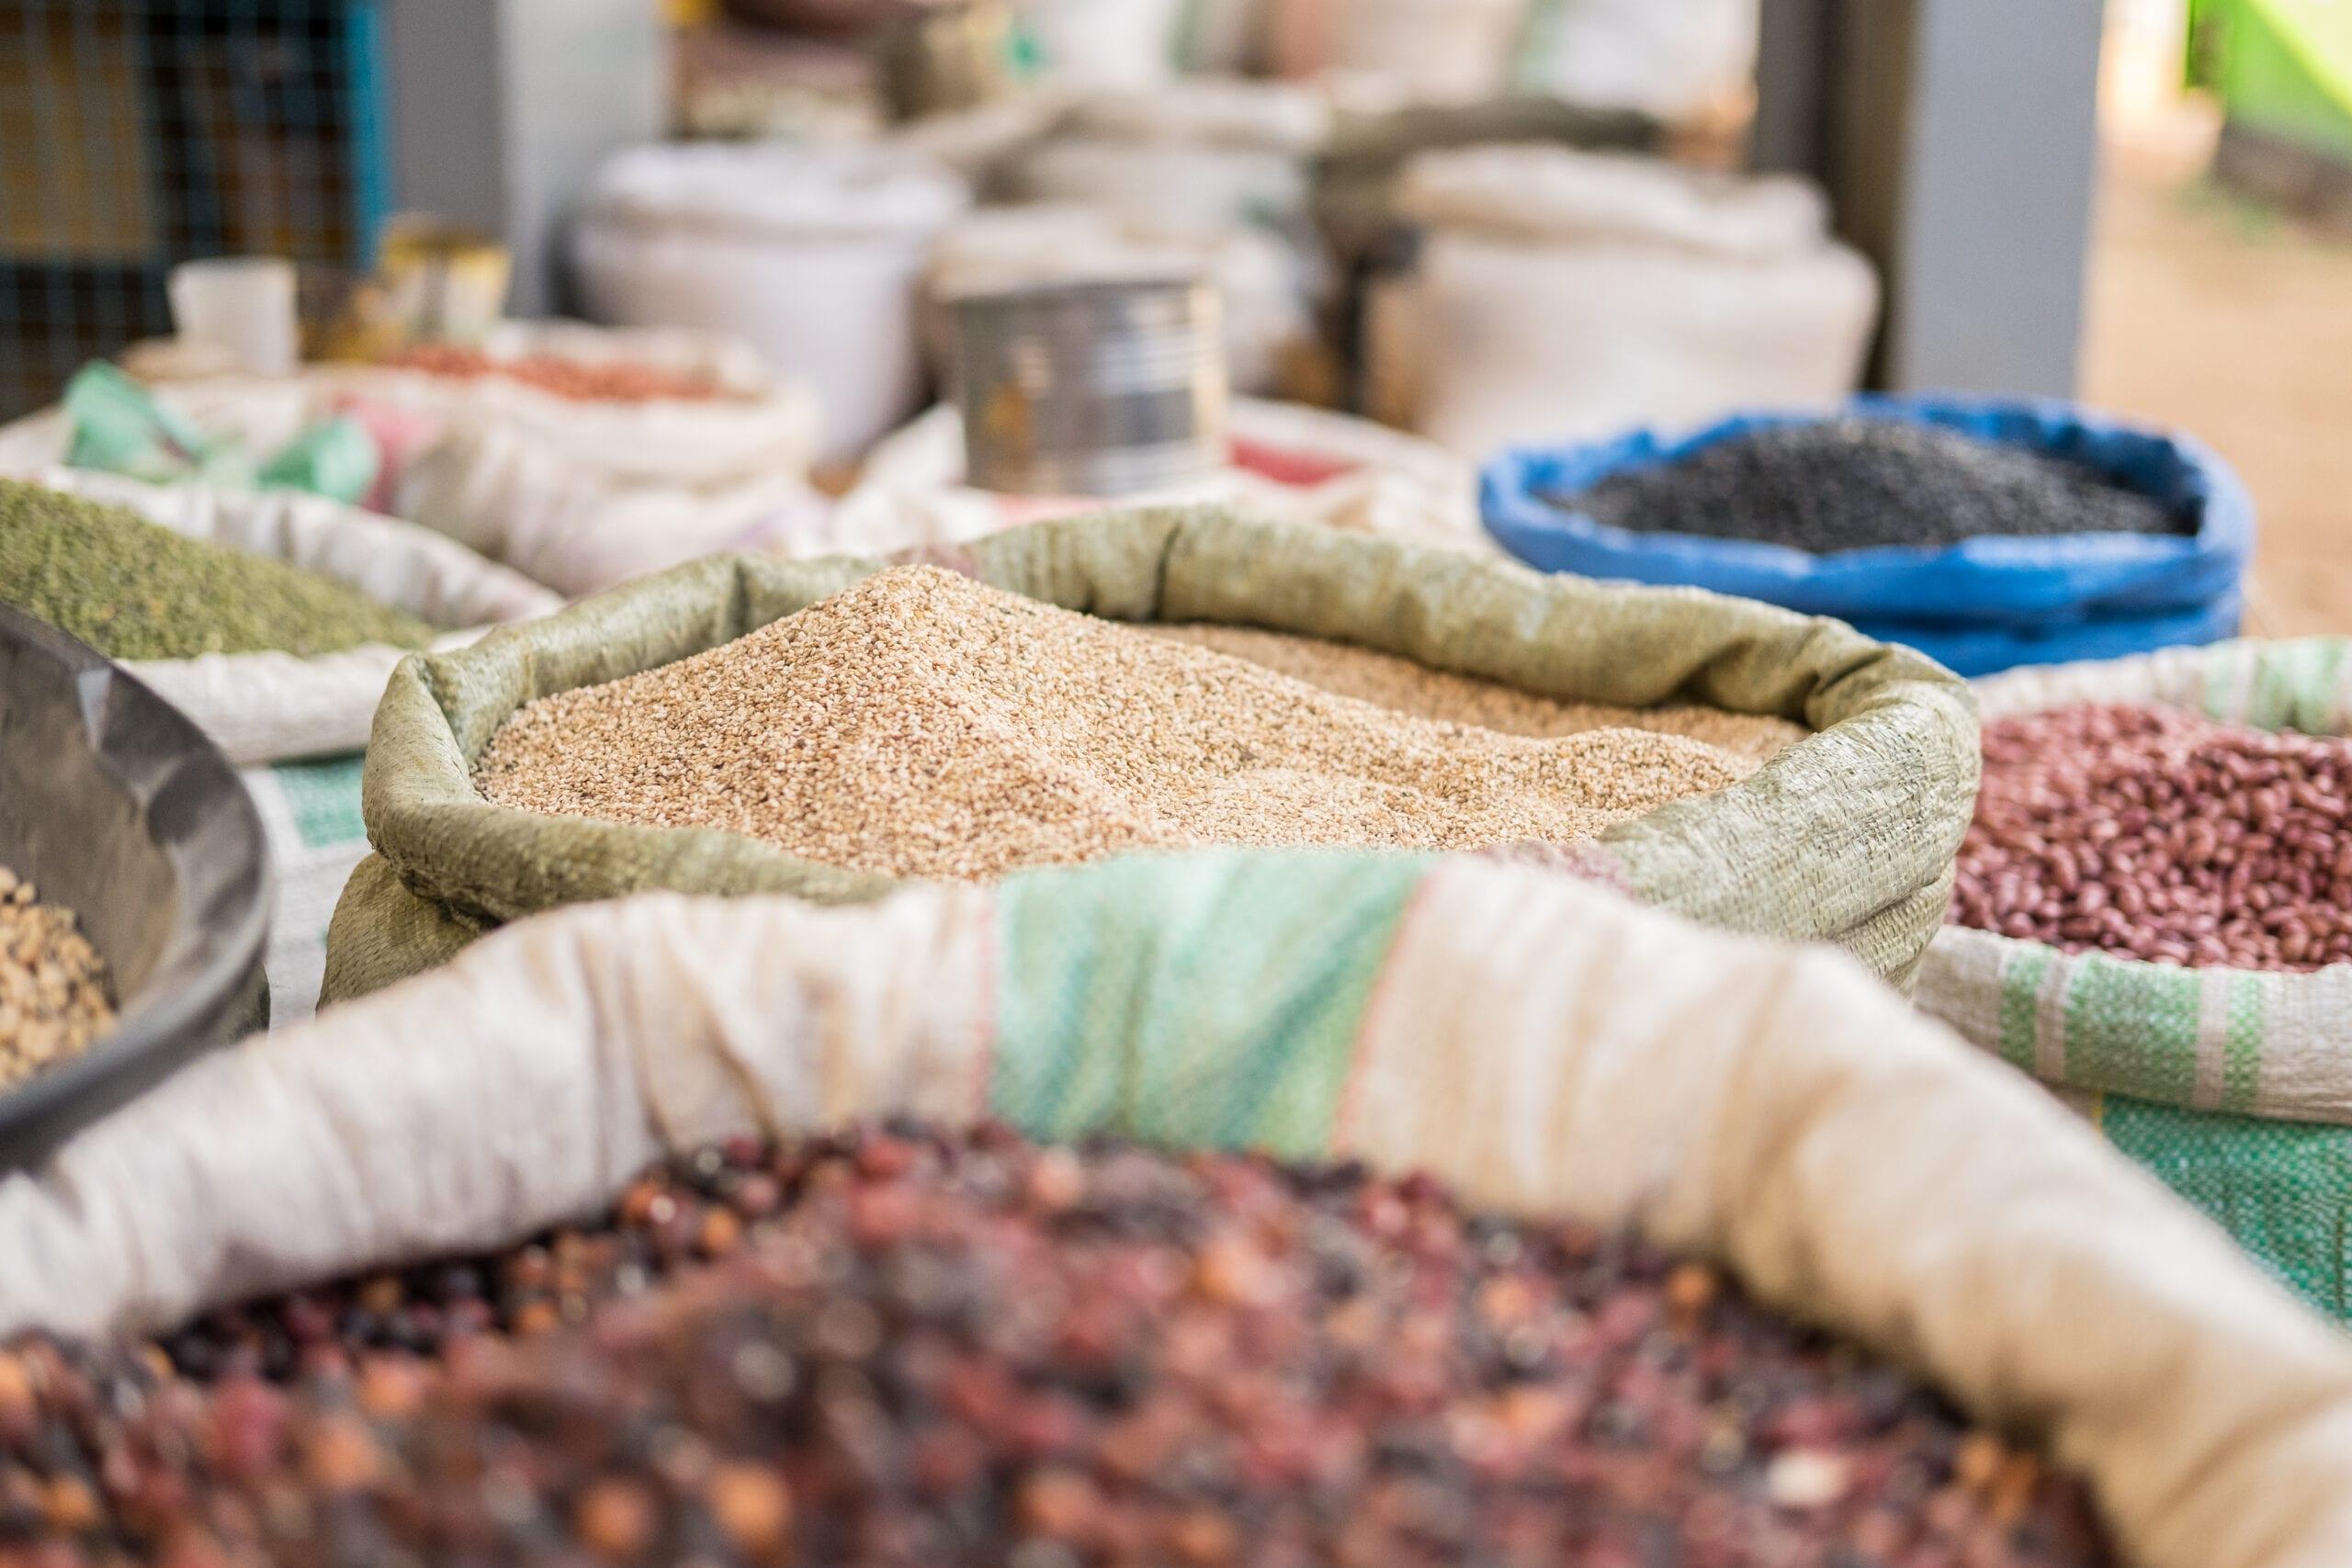 Sacks of grains, including maize, on sale in Busia market, Kenya (Photo: Shutterstock)